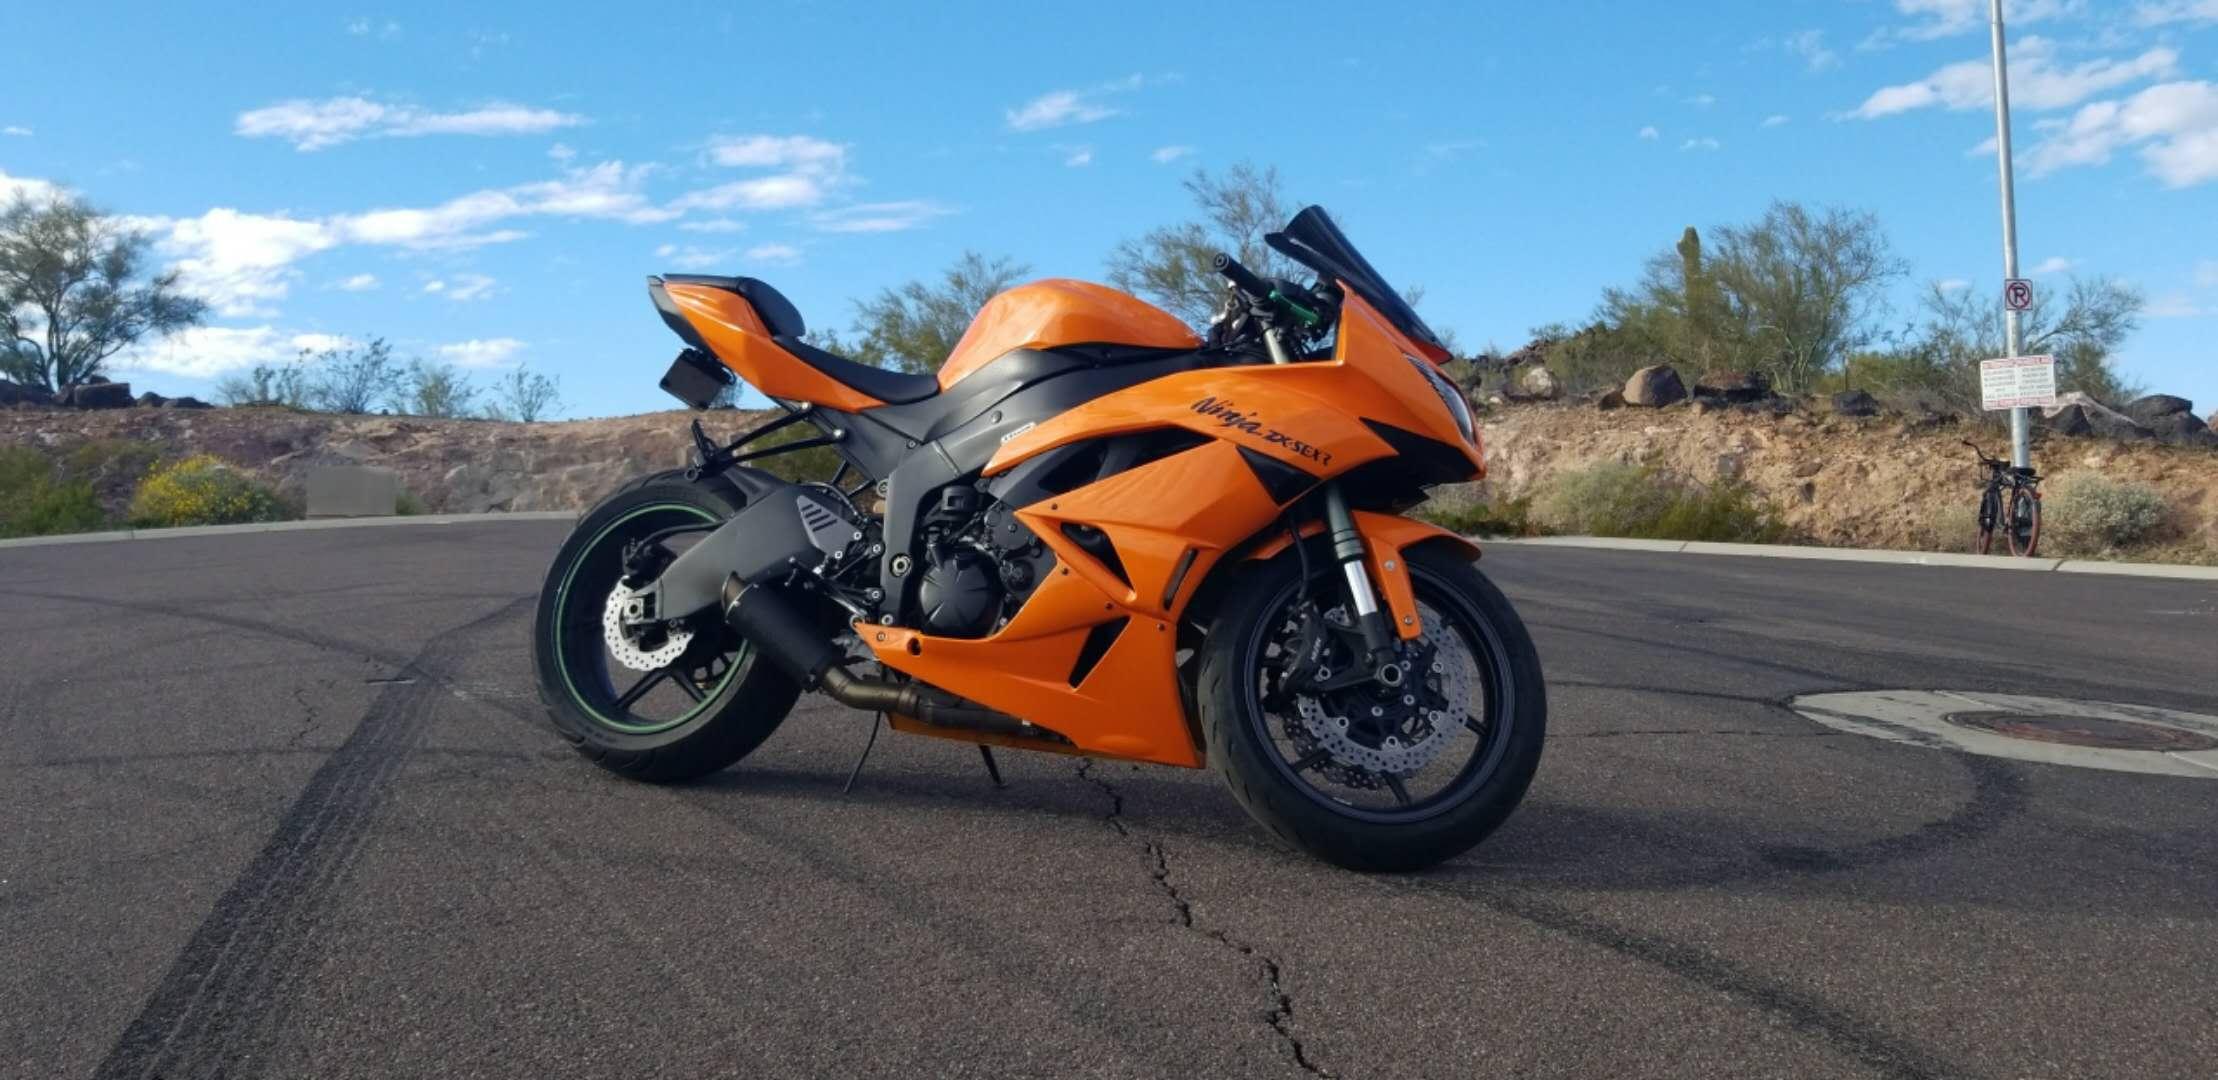 2009 2012 Zx6r Orange With Gas Tank Cover Aumotorfairing